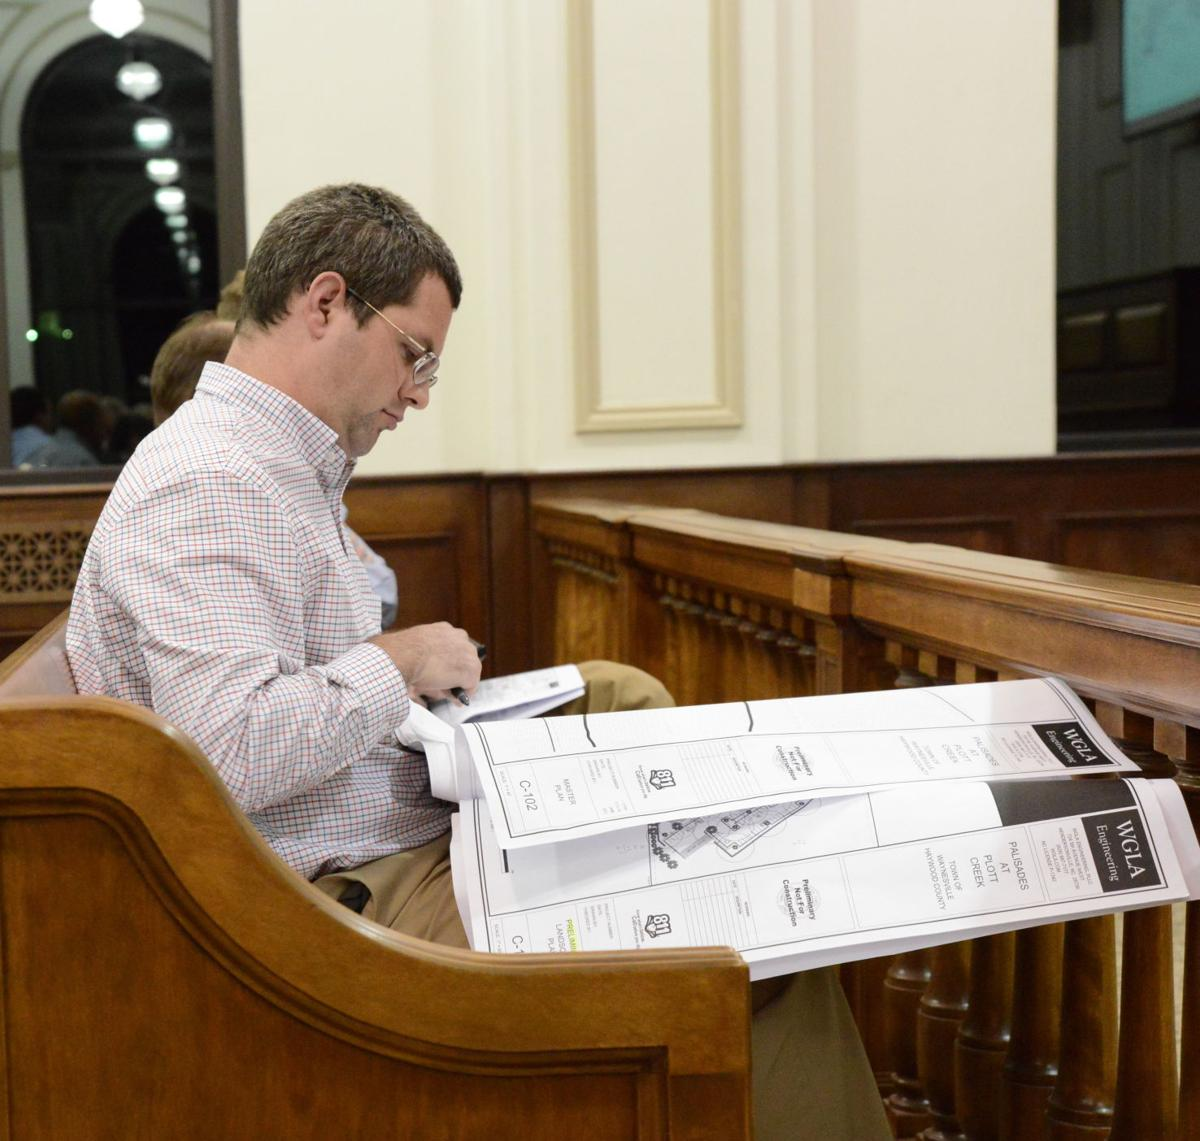 plott creek apartment site plan hearing william ratchford.JPG